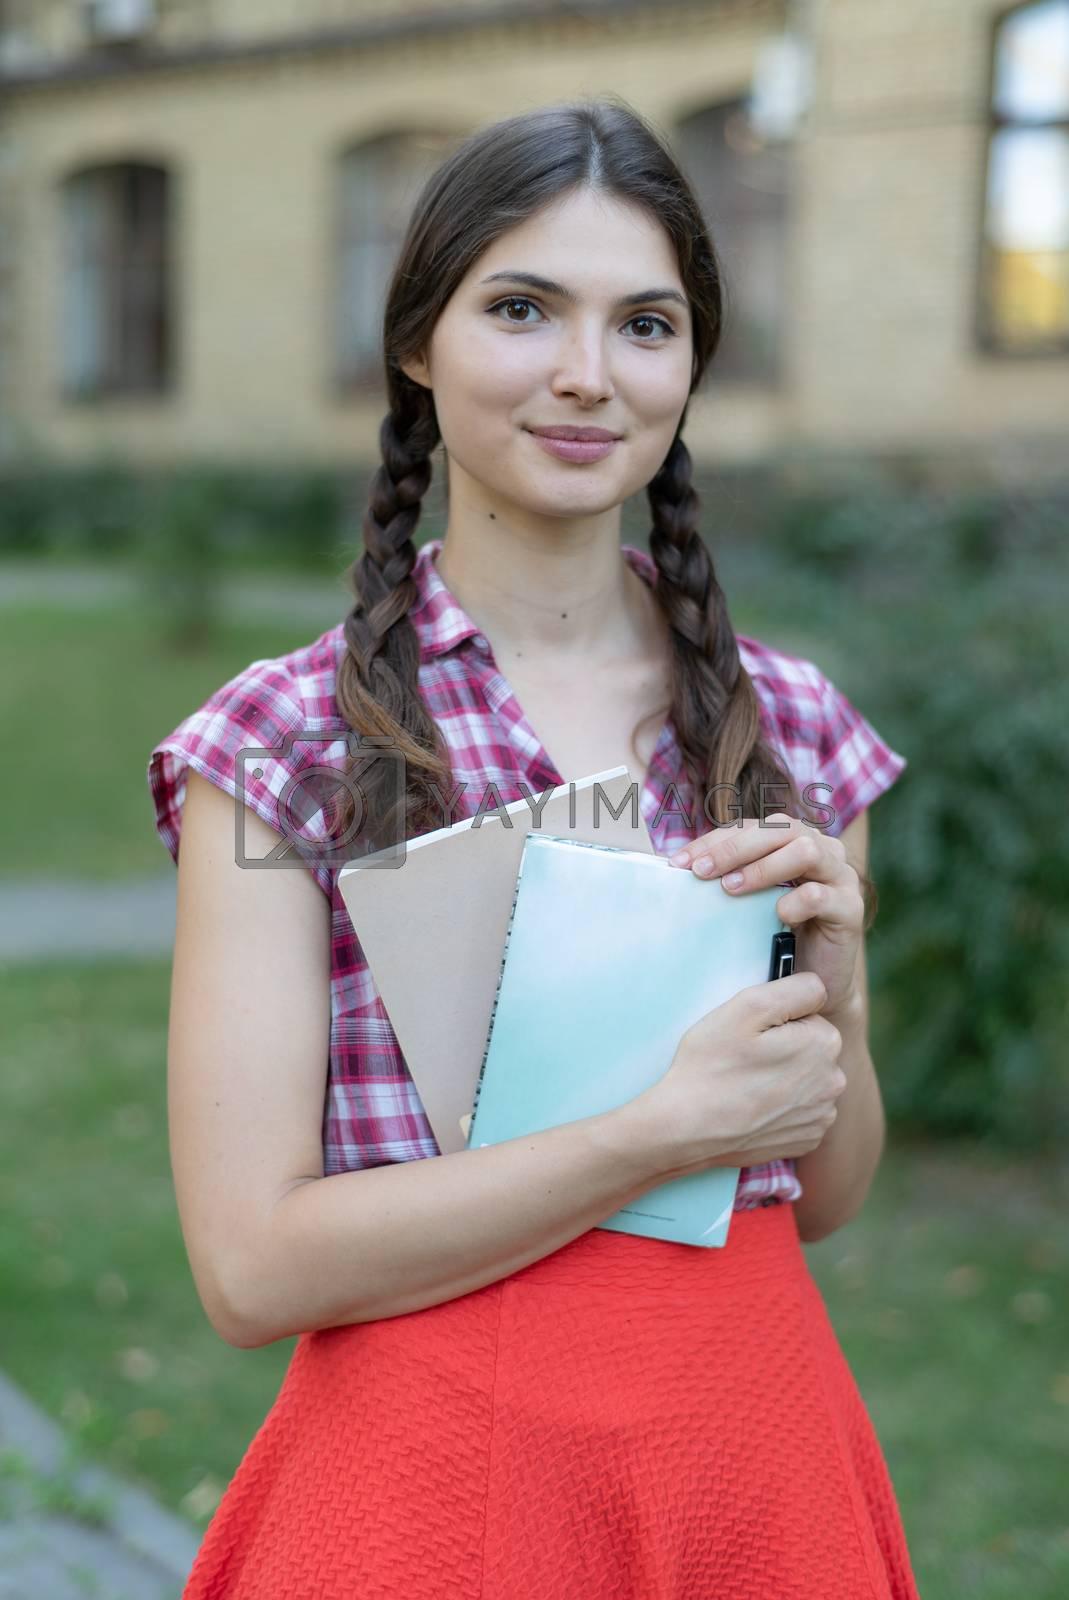 Girl student in red skirt and plaid shirt. Kyiv. Ukraine